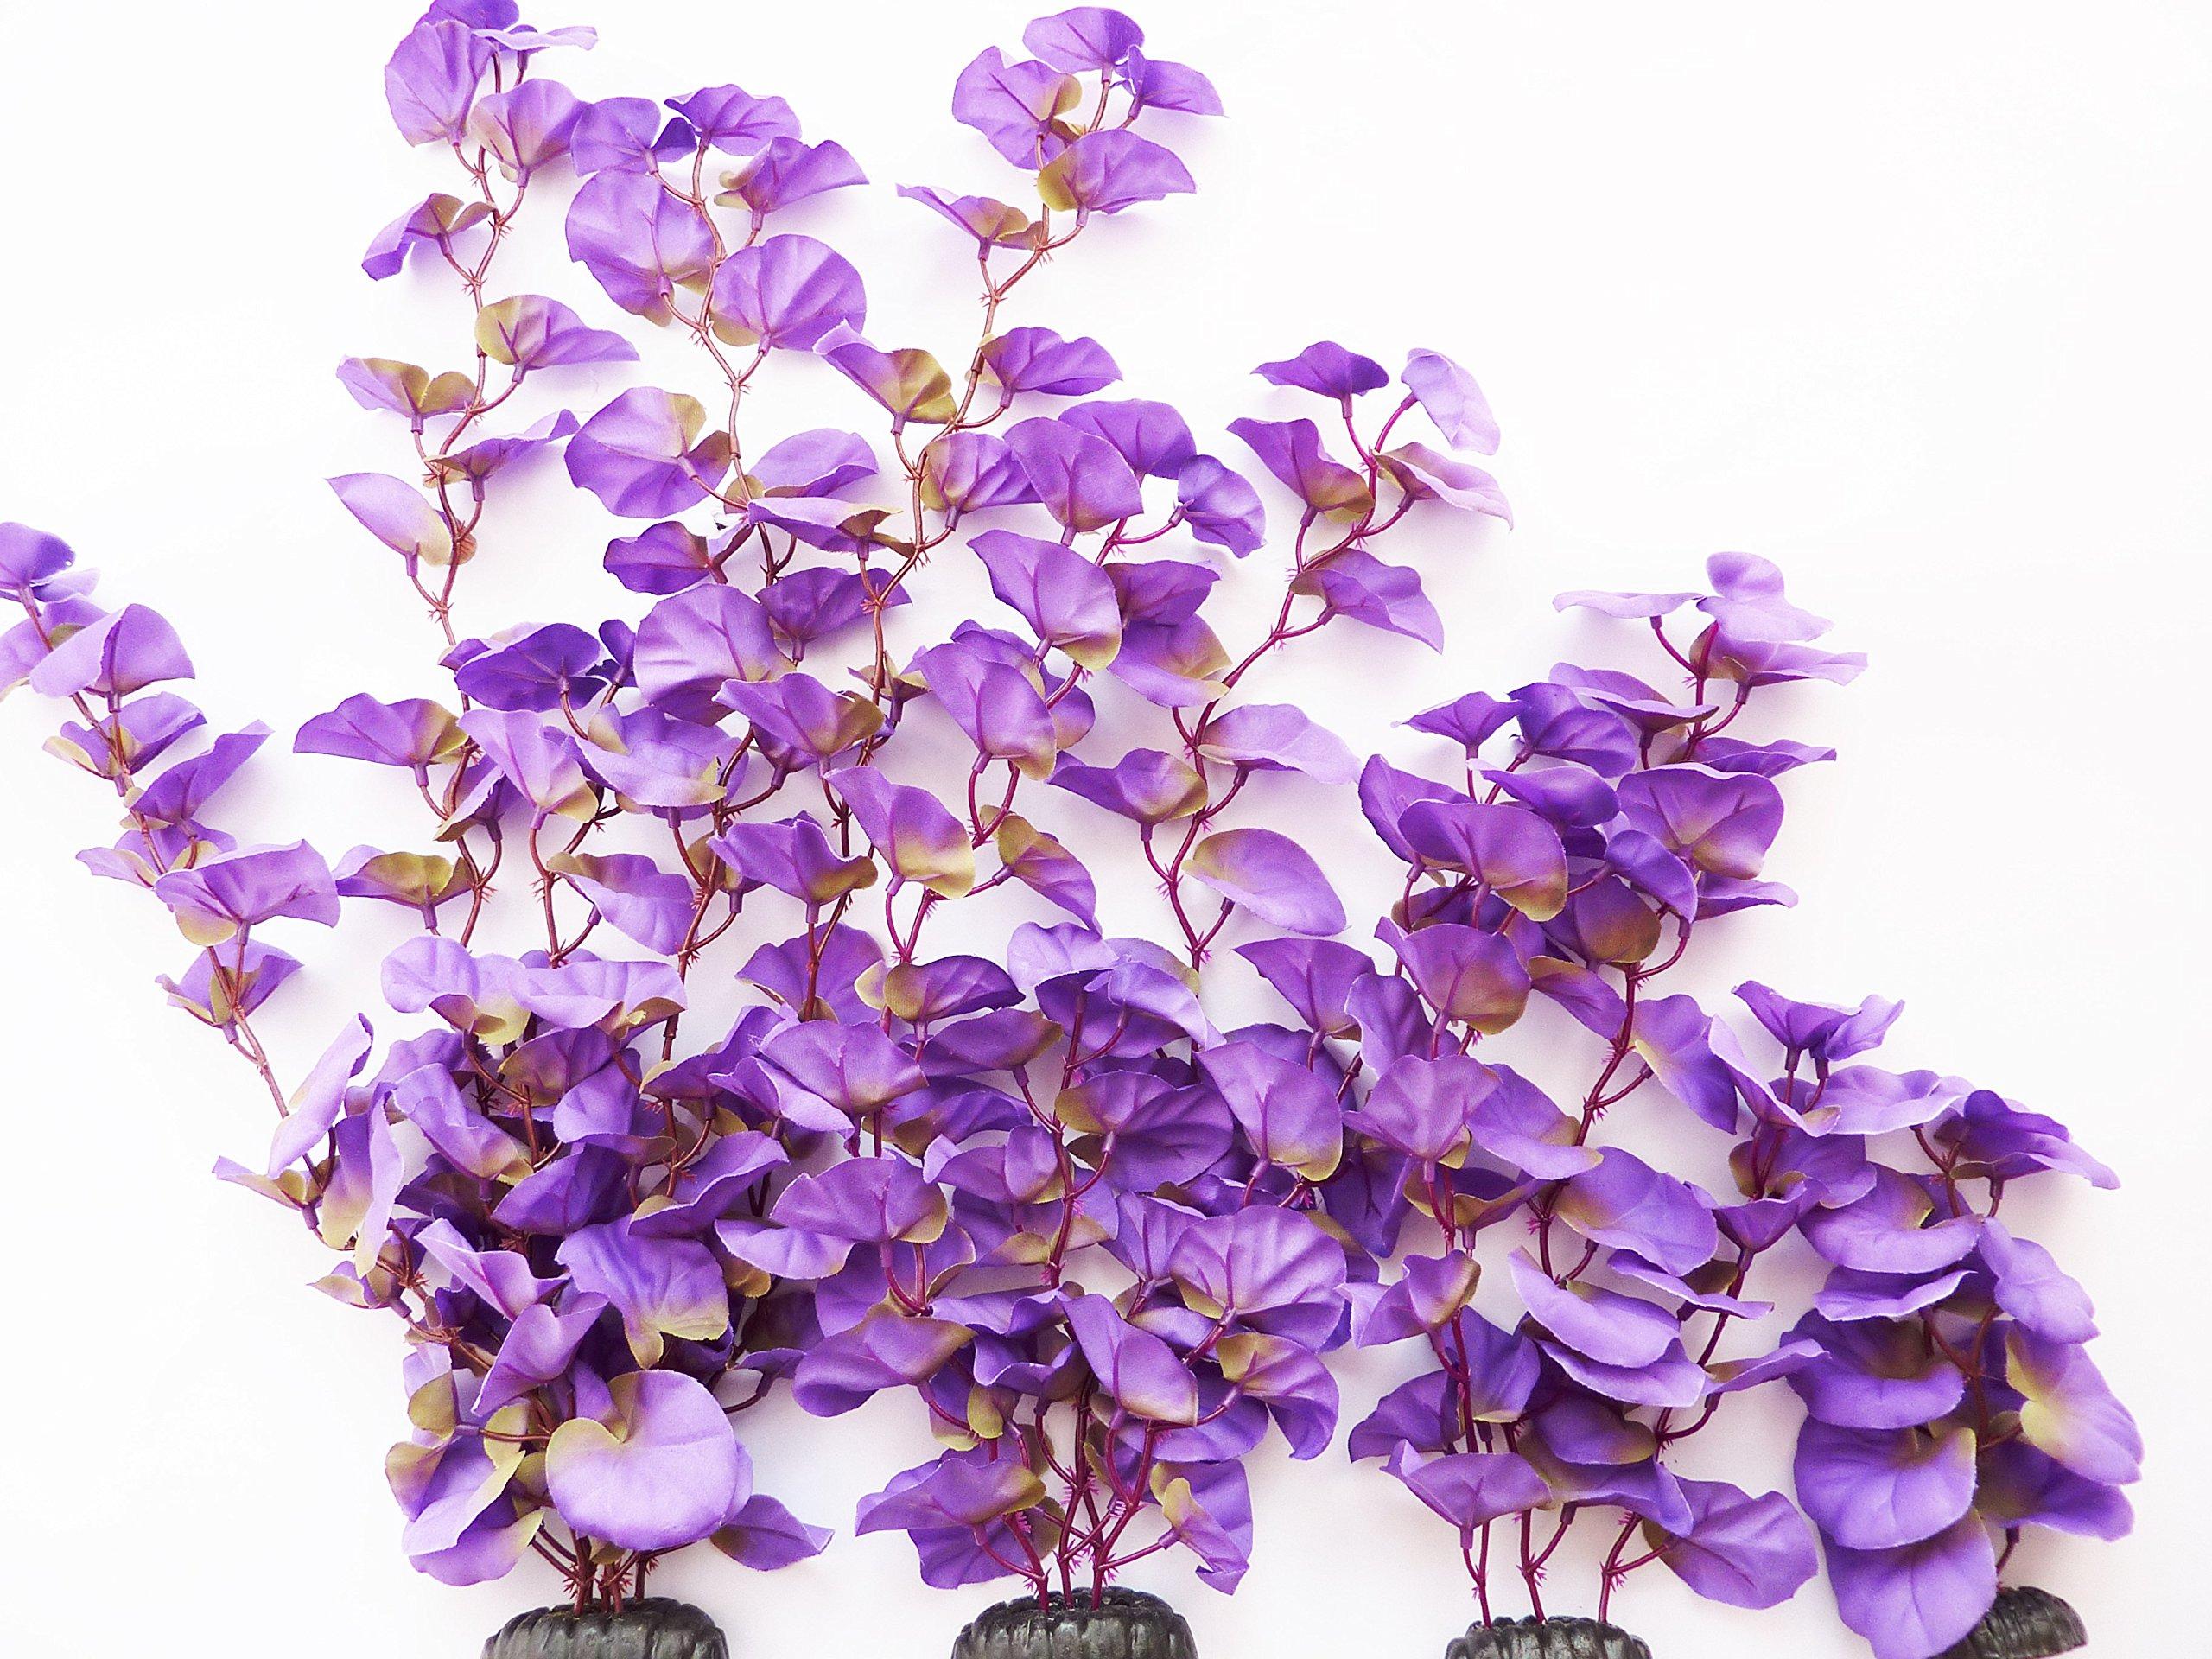 Aquarium Plants (Silk) Purple Lily Fish Tank Decor (Purple Lily 4 Pack)